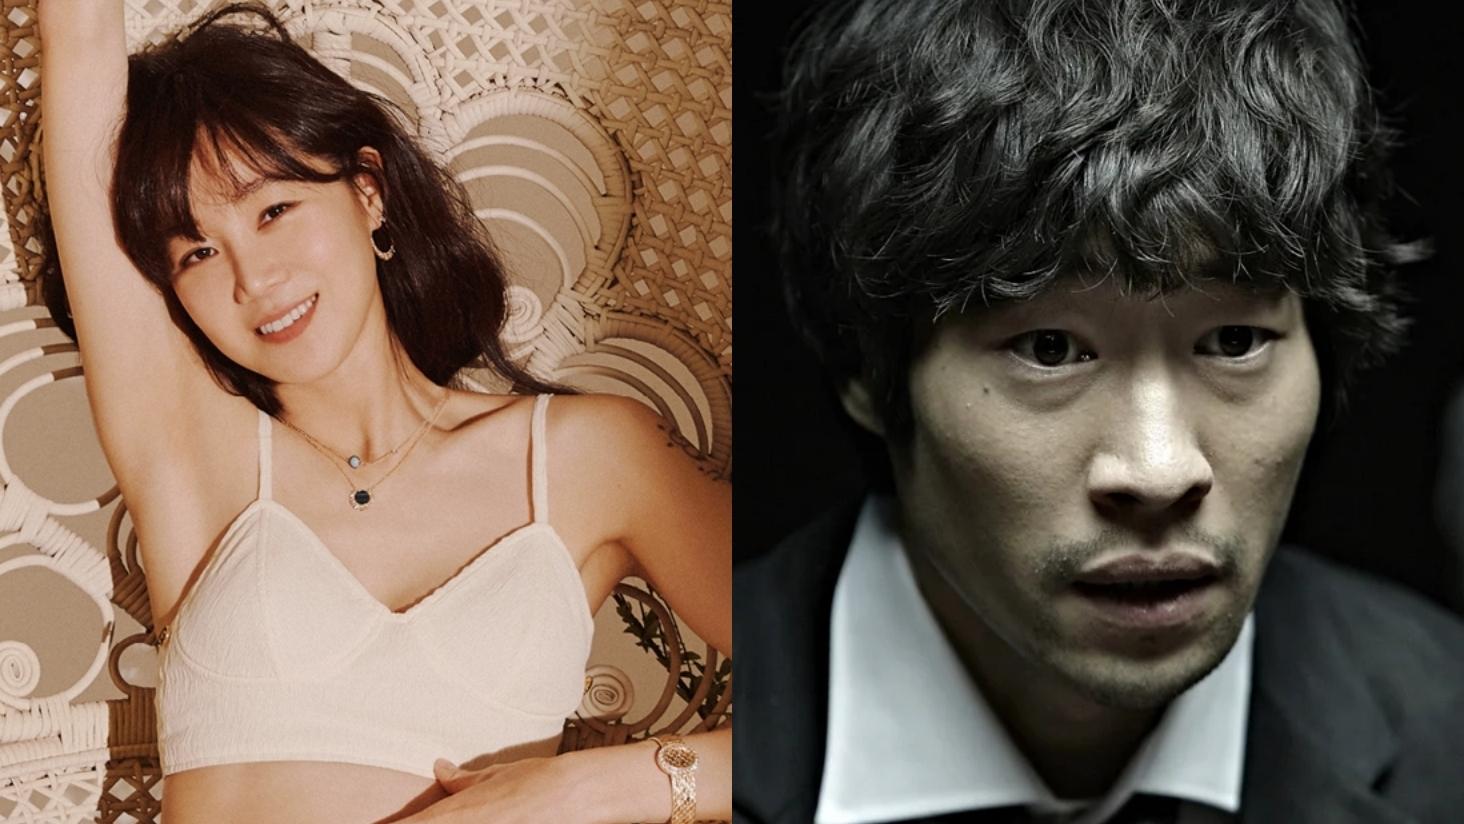 Her Ex-Boyfriend Announces Marriage, Gong Hyo Jin's Instagram Flooded by Netizen Comments